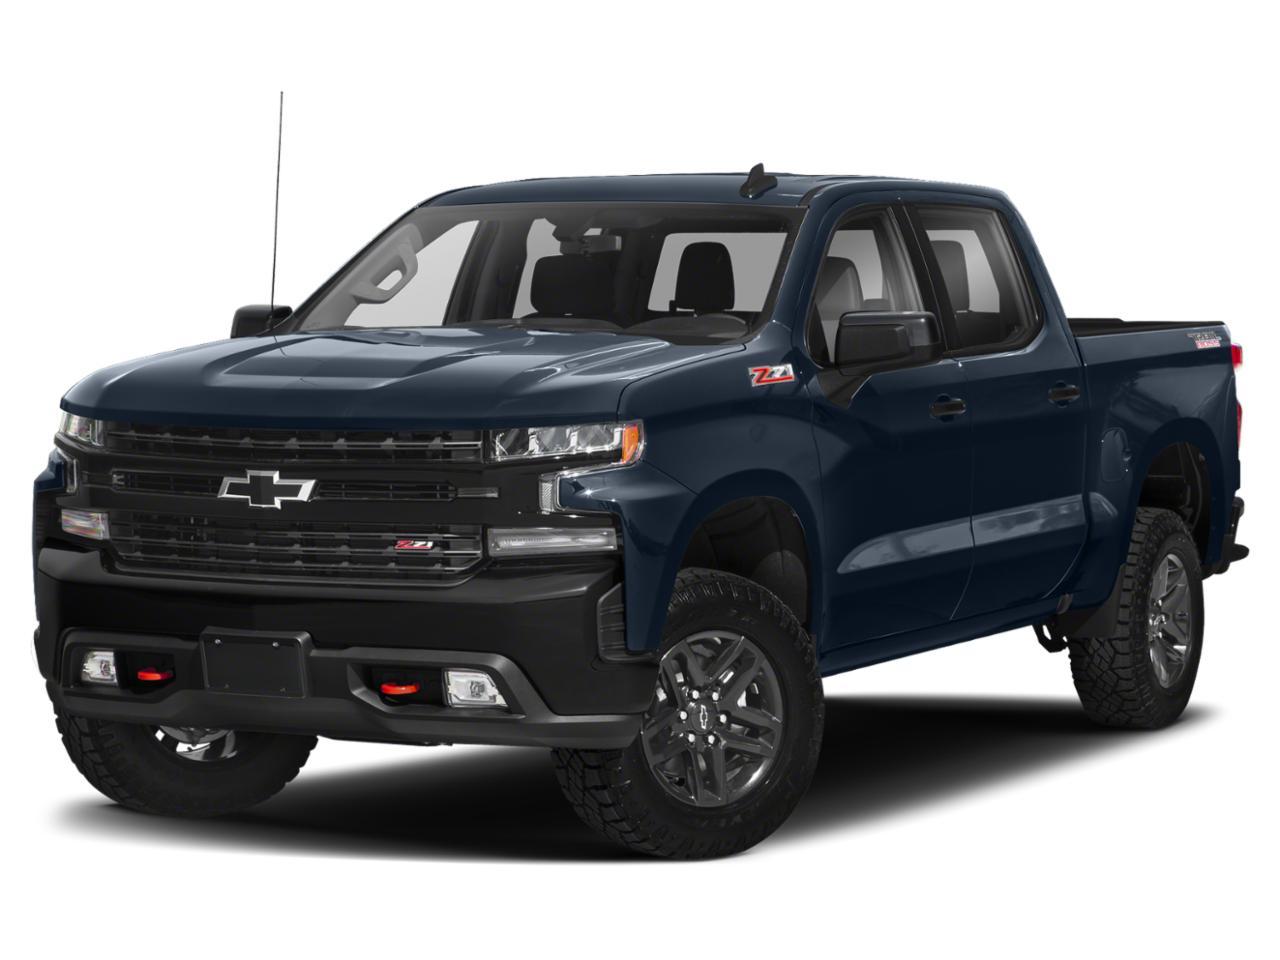 Sky Blue Metallic 2019 Chevrolet Silverado 1500 LT TRAIL BOSS Crew Cab Pickup Wake Forest NC